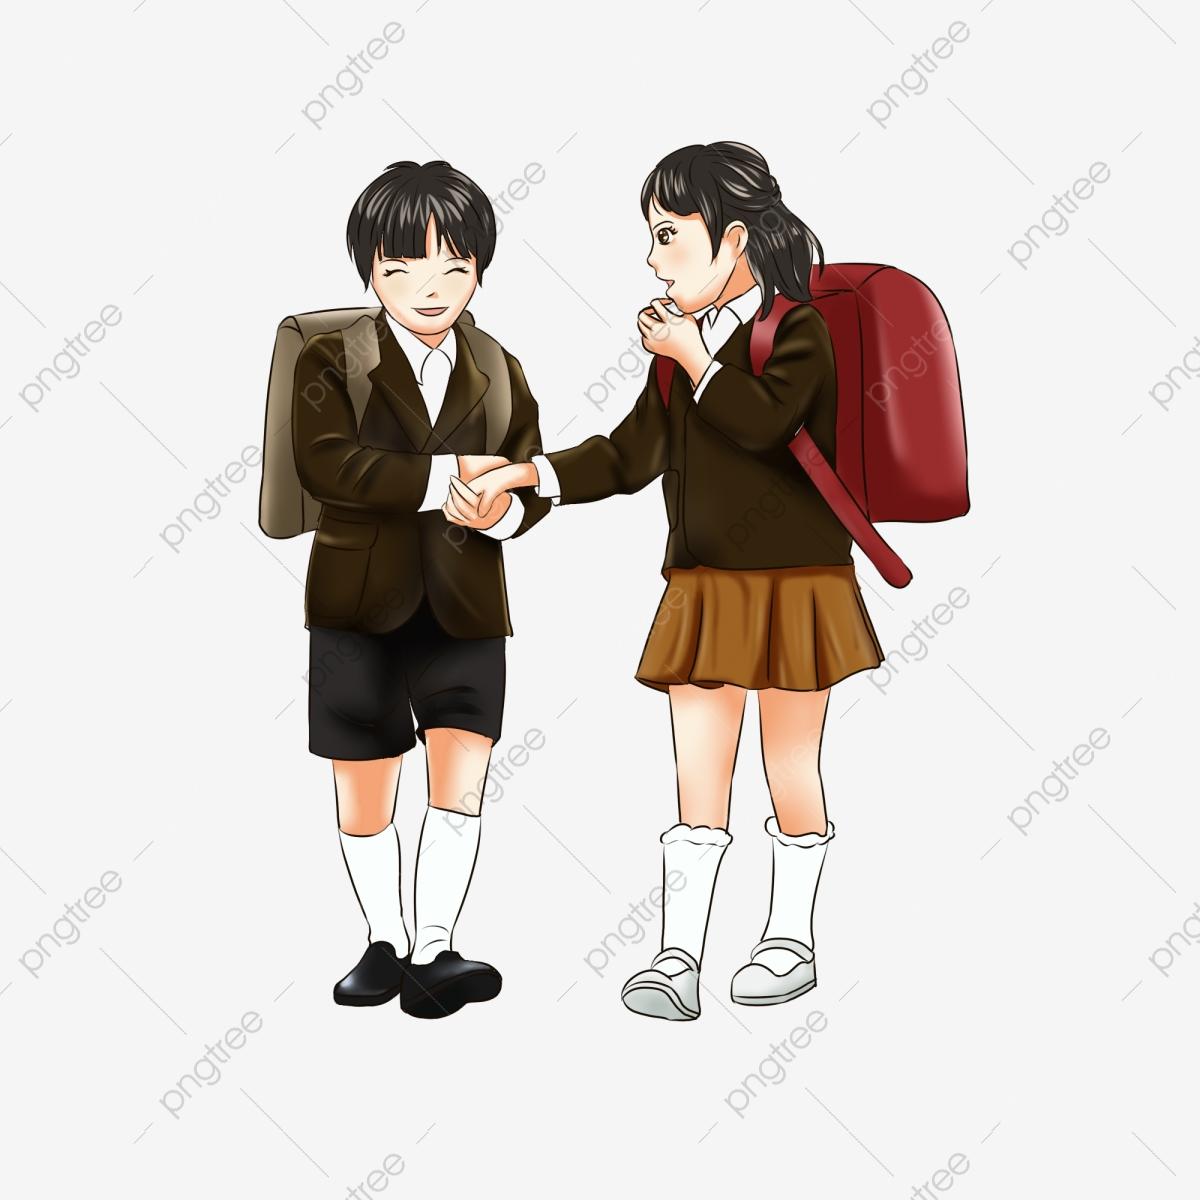 School Boys And Girls Schoolbag Cartoon Creative Image.